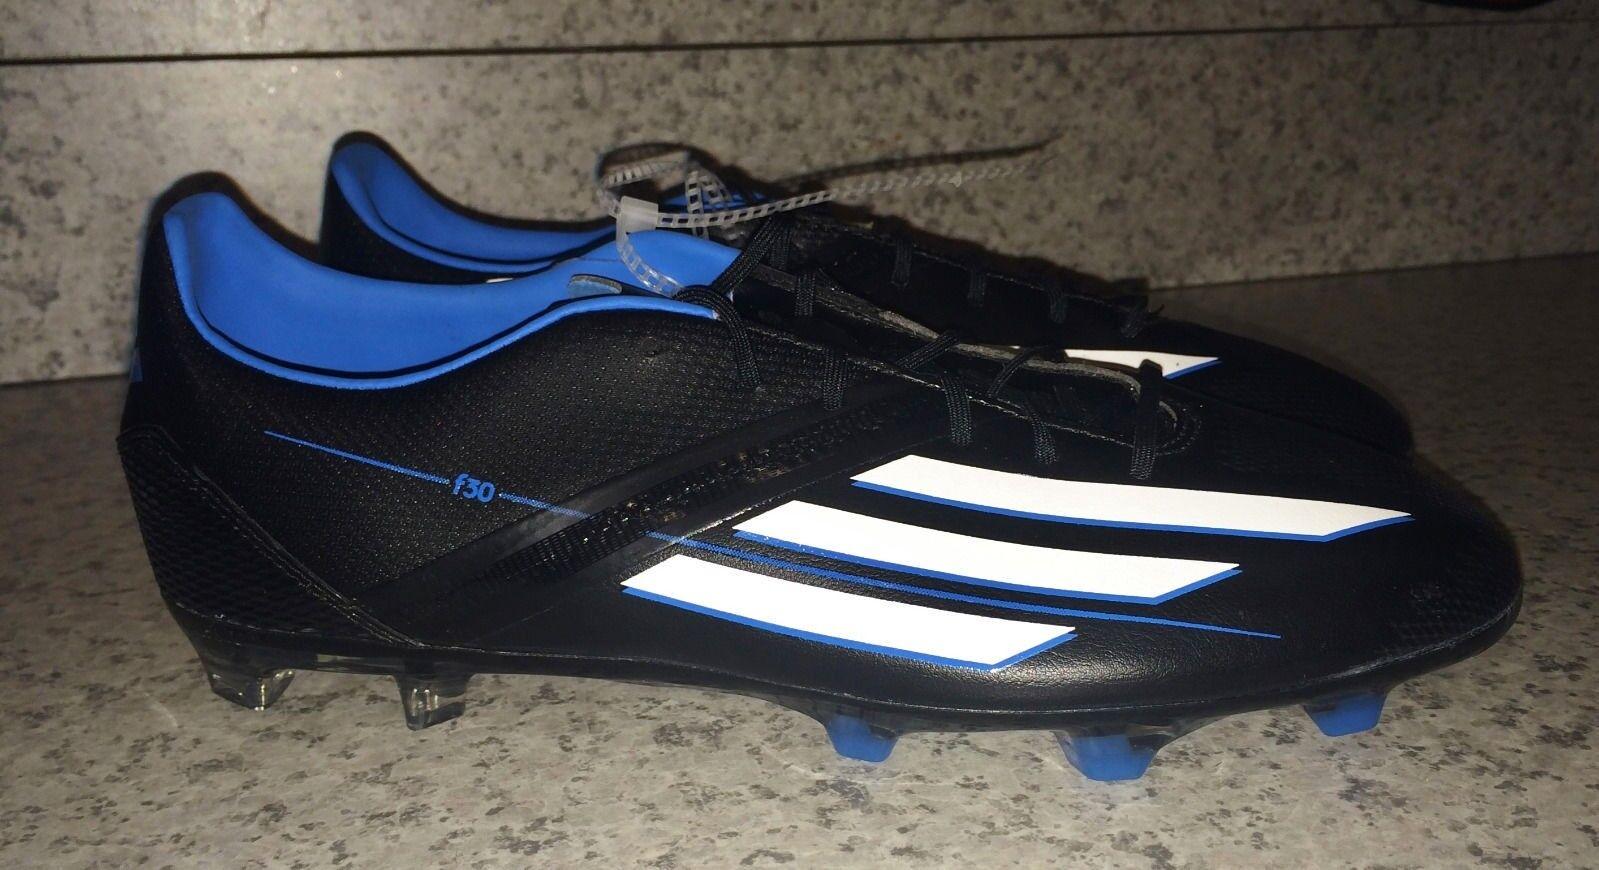 ADIDAS F30 TRX FG Black Solar bluee Wh Soccer Cleats Futball Boots NEW Mens Sz 8